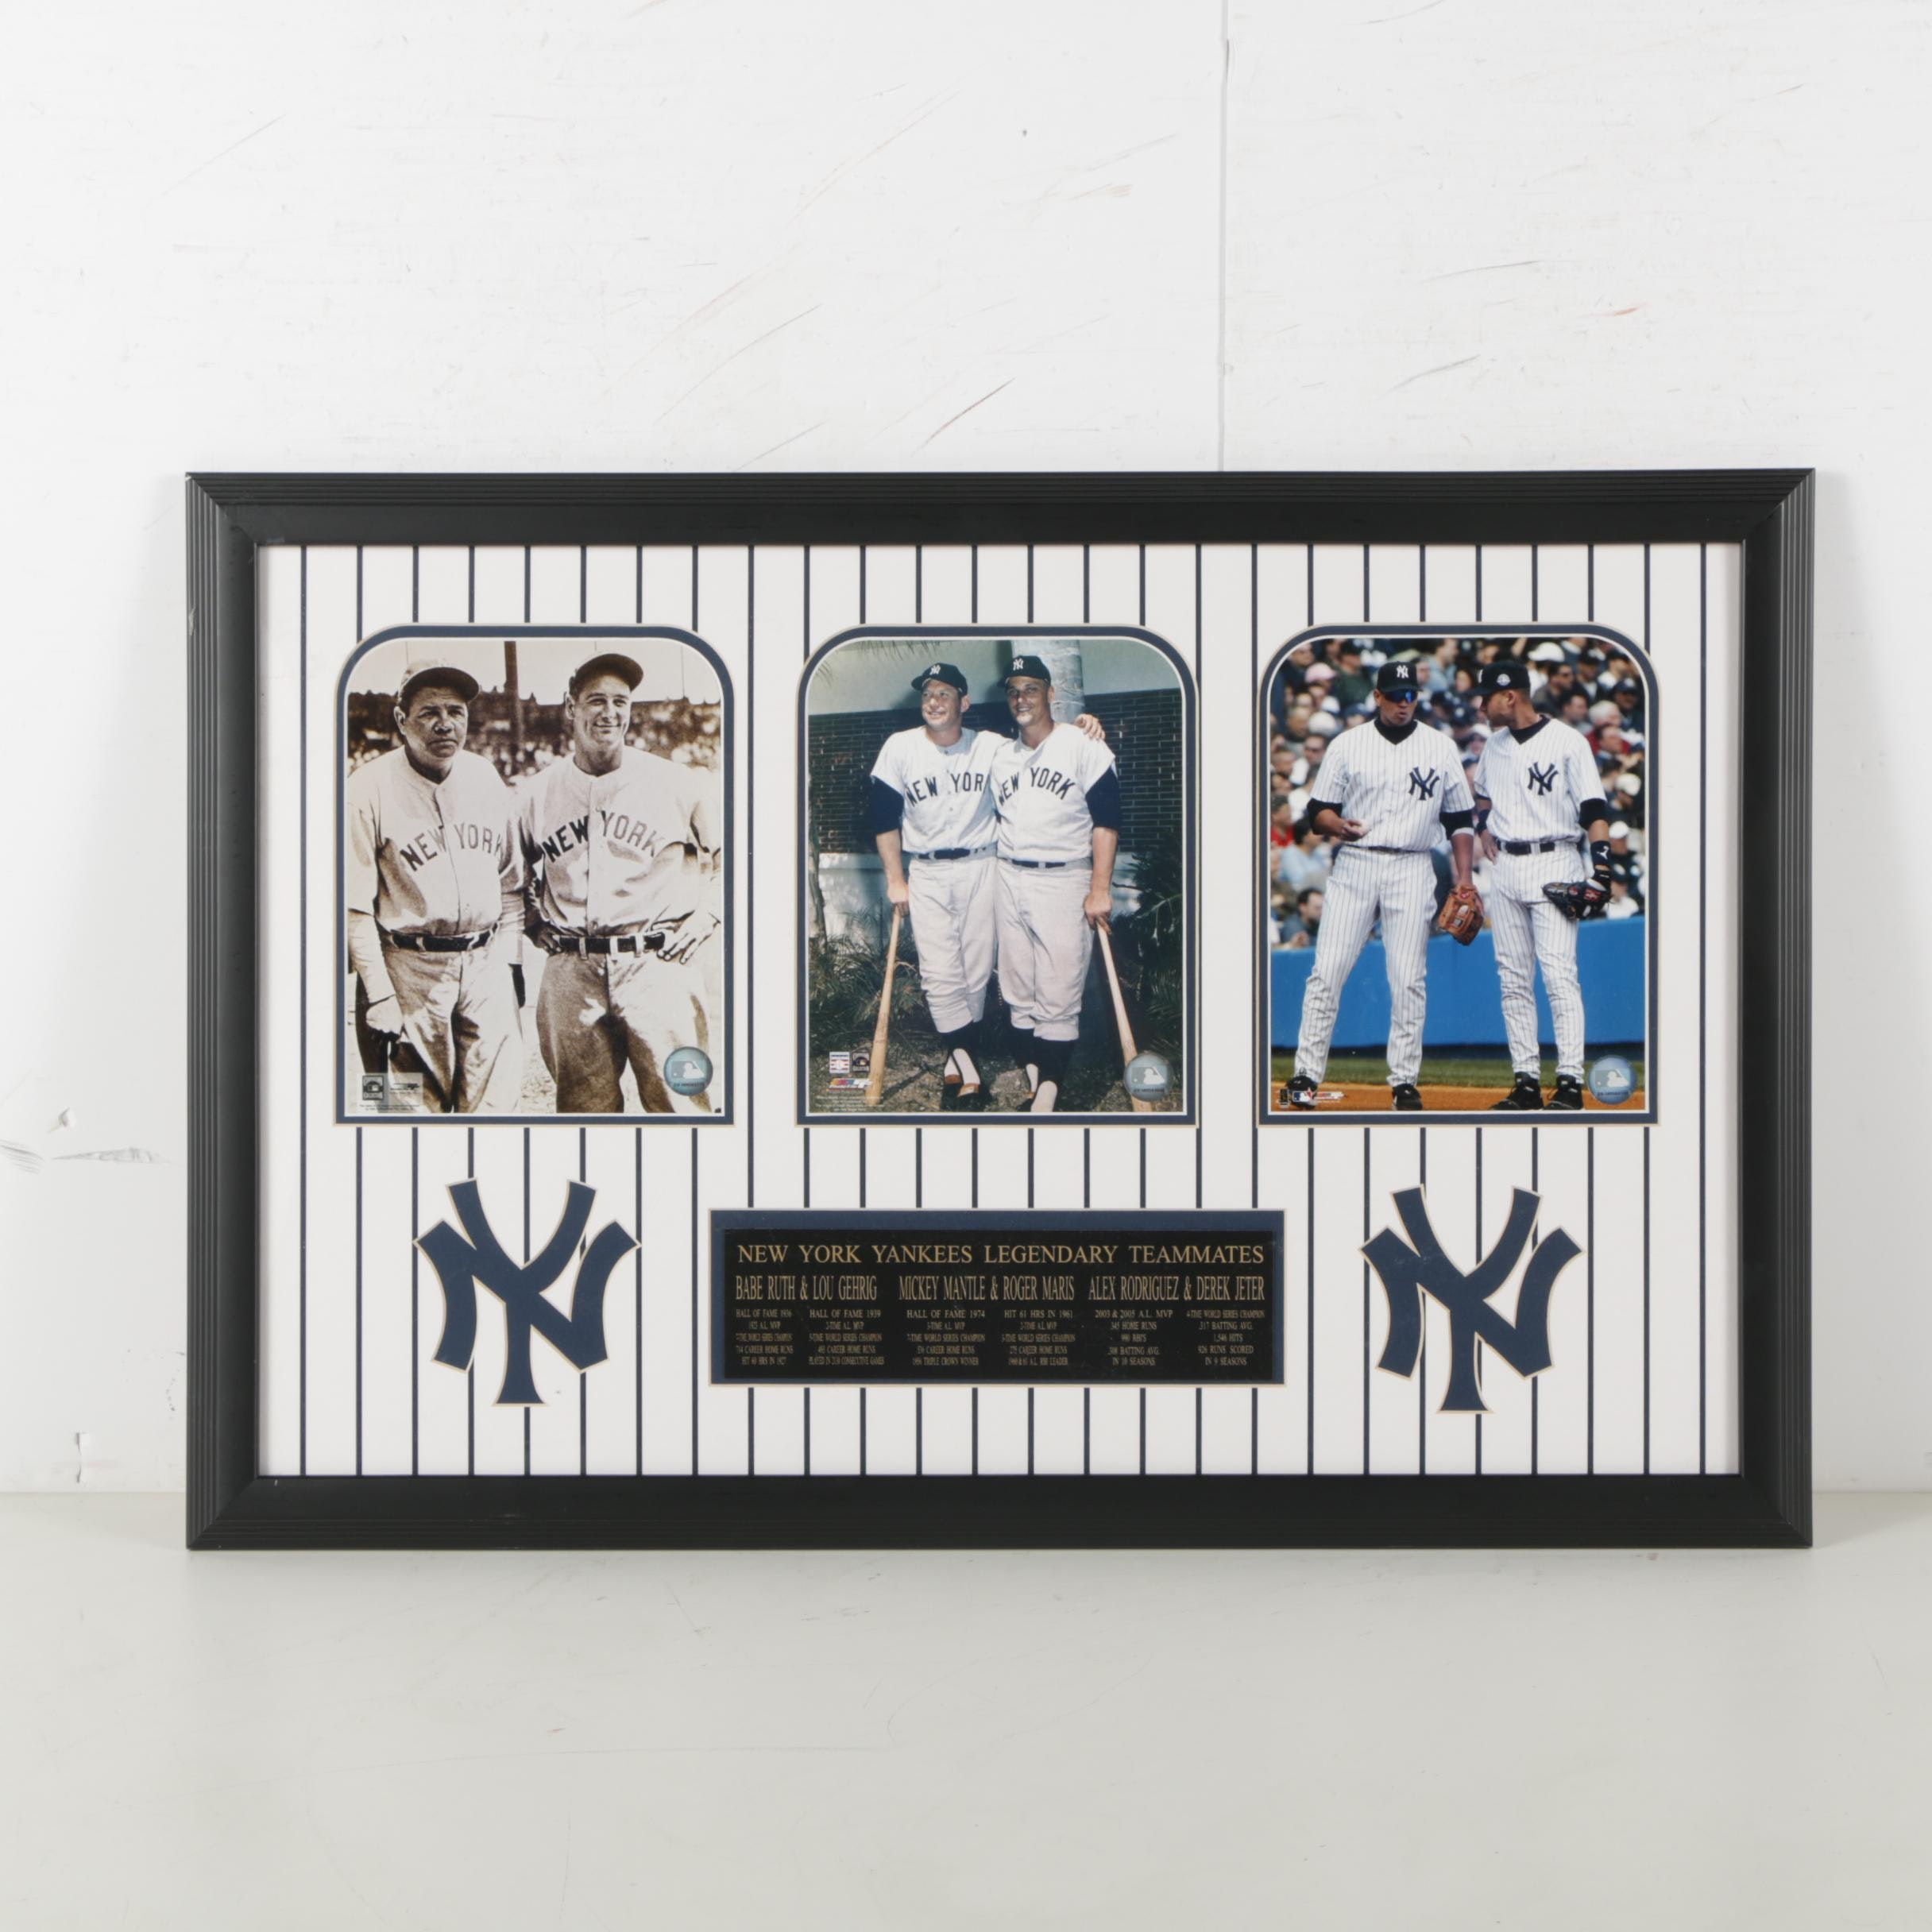 New York Yankees Legendary Teammates Plaque